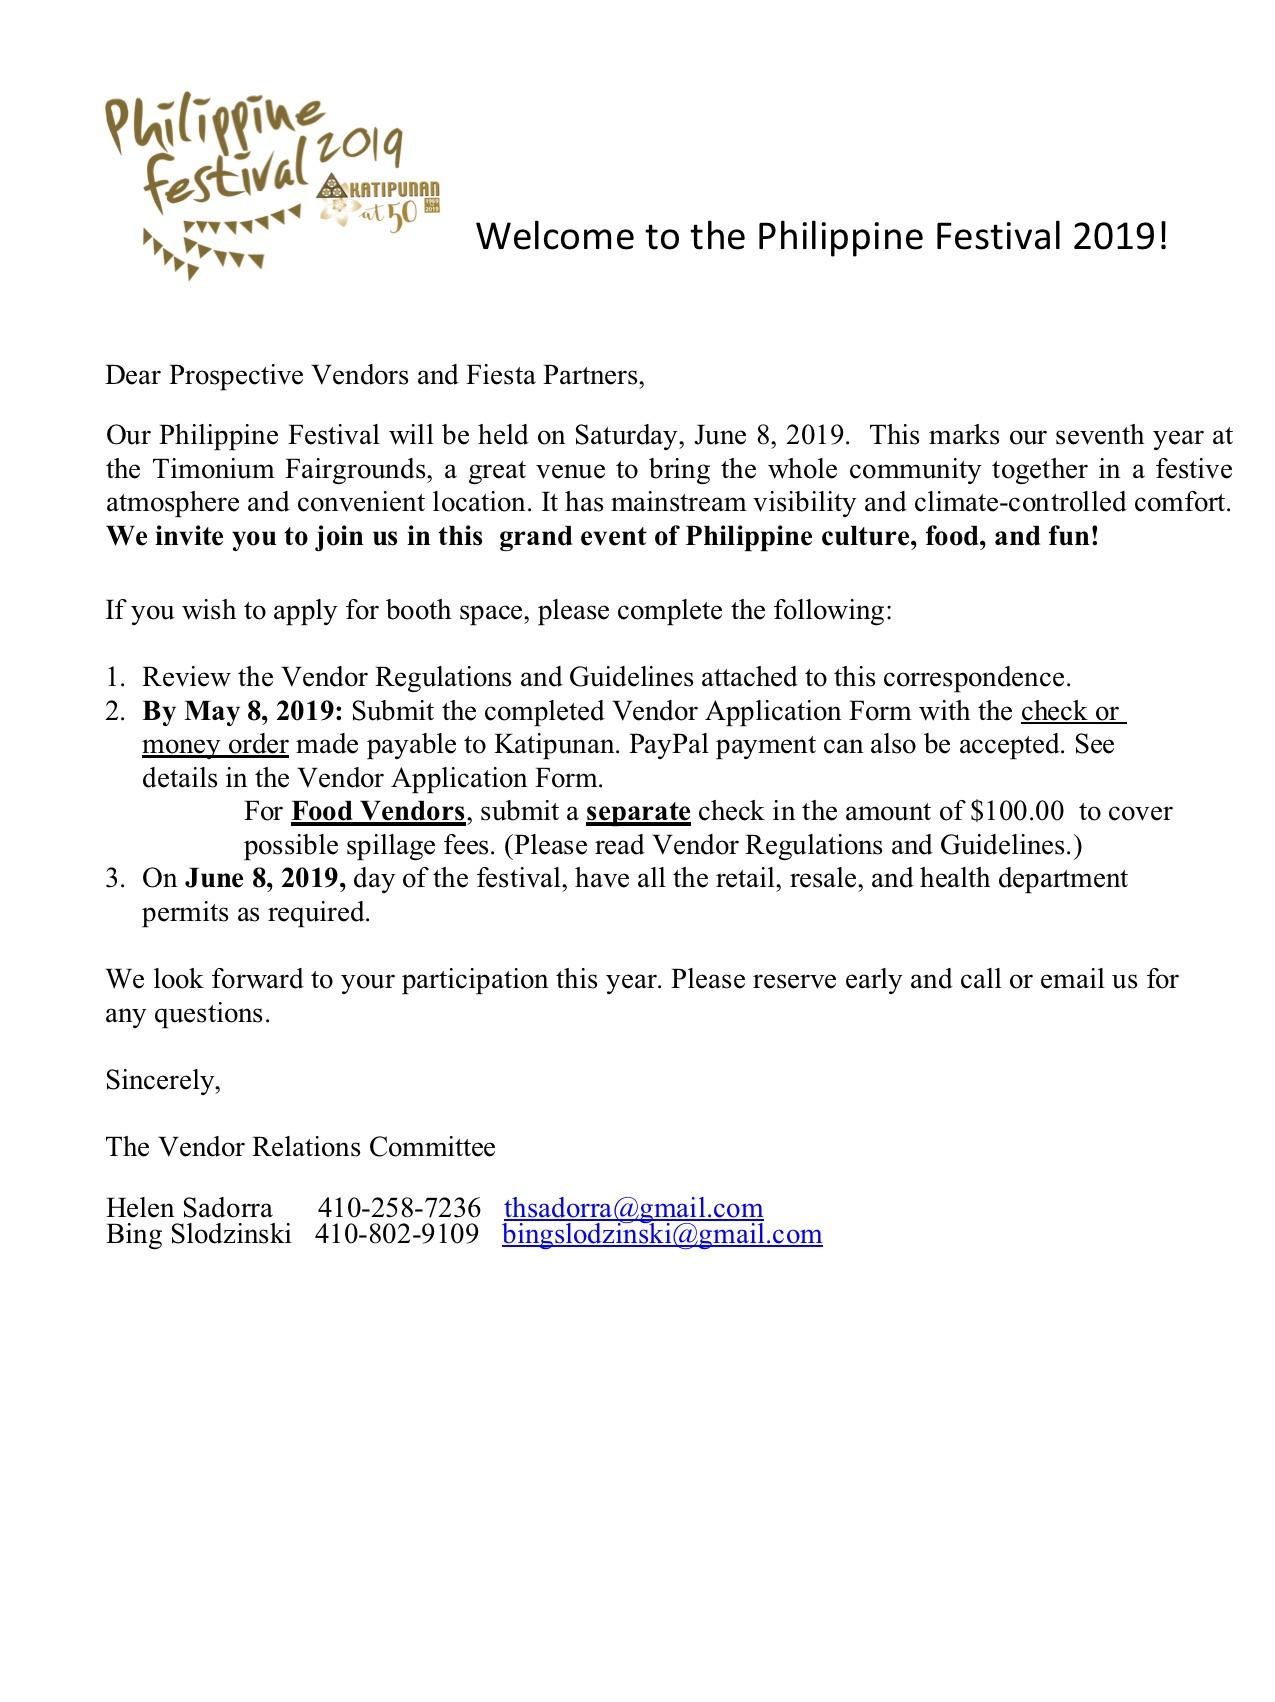 Philippine Festival 2019 Welcome Vendors.jpg